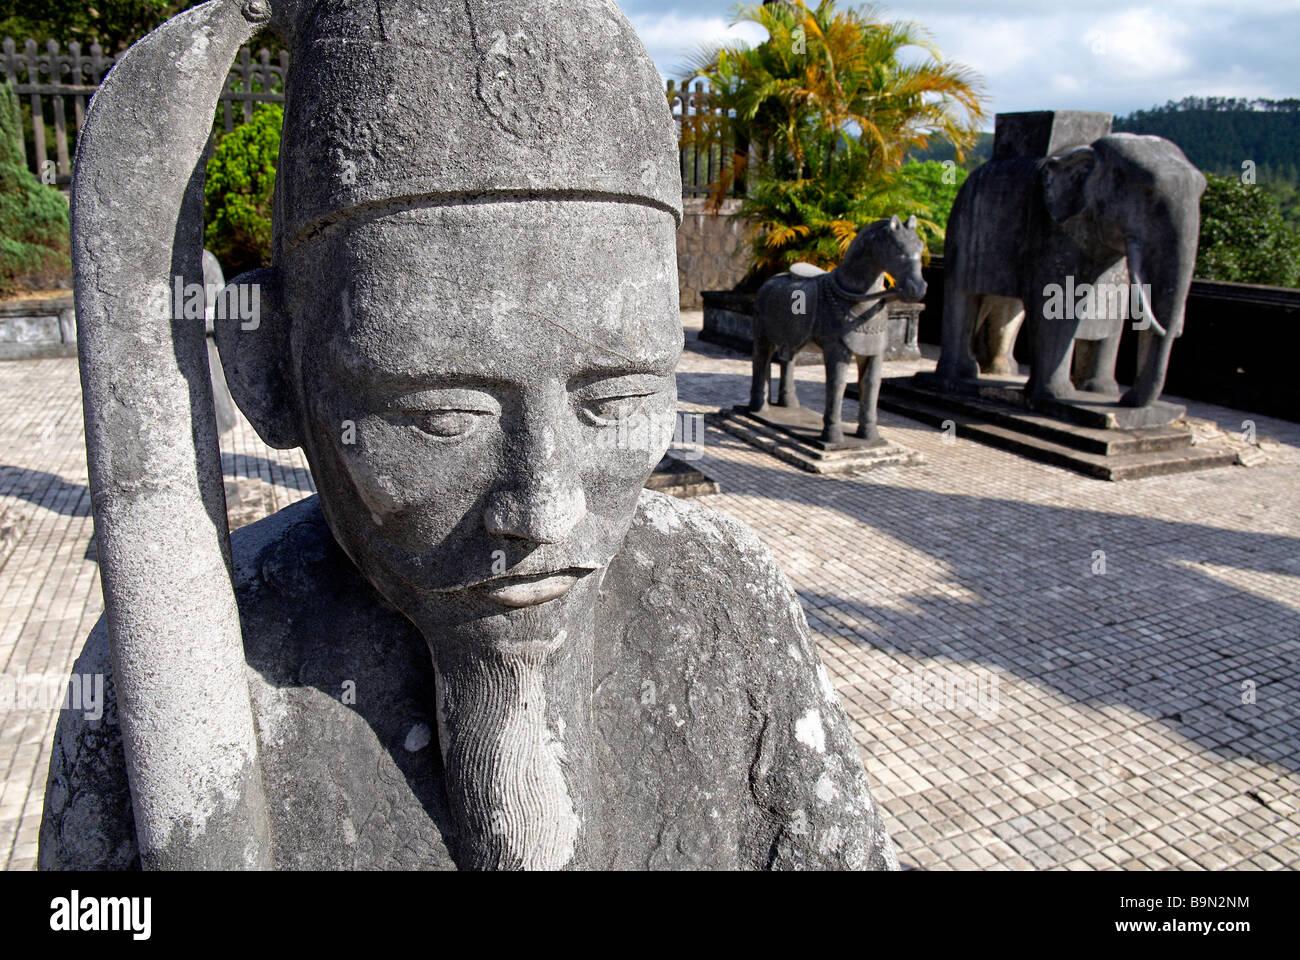 Vietnam, Thua Thien Hue province, Hue, Khai Dinh tomb - Stock Image